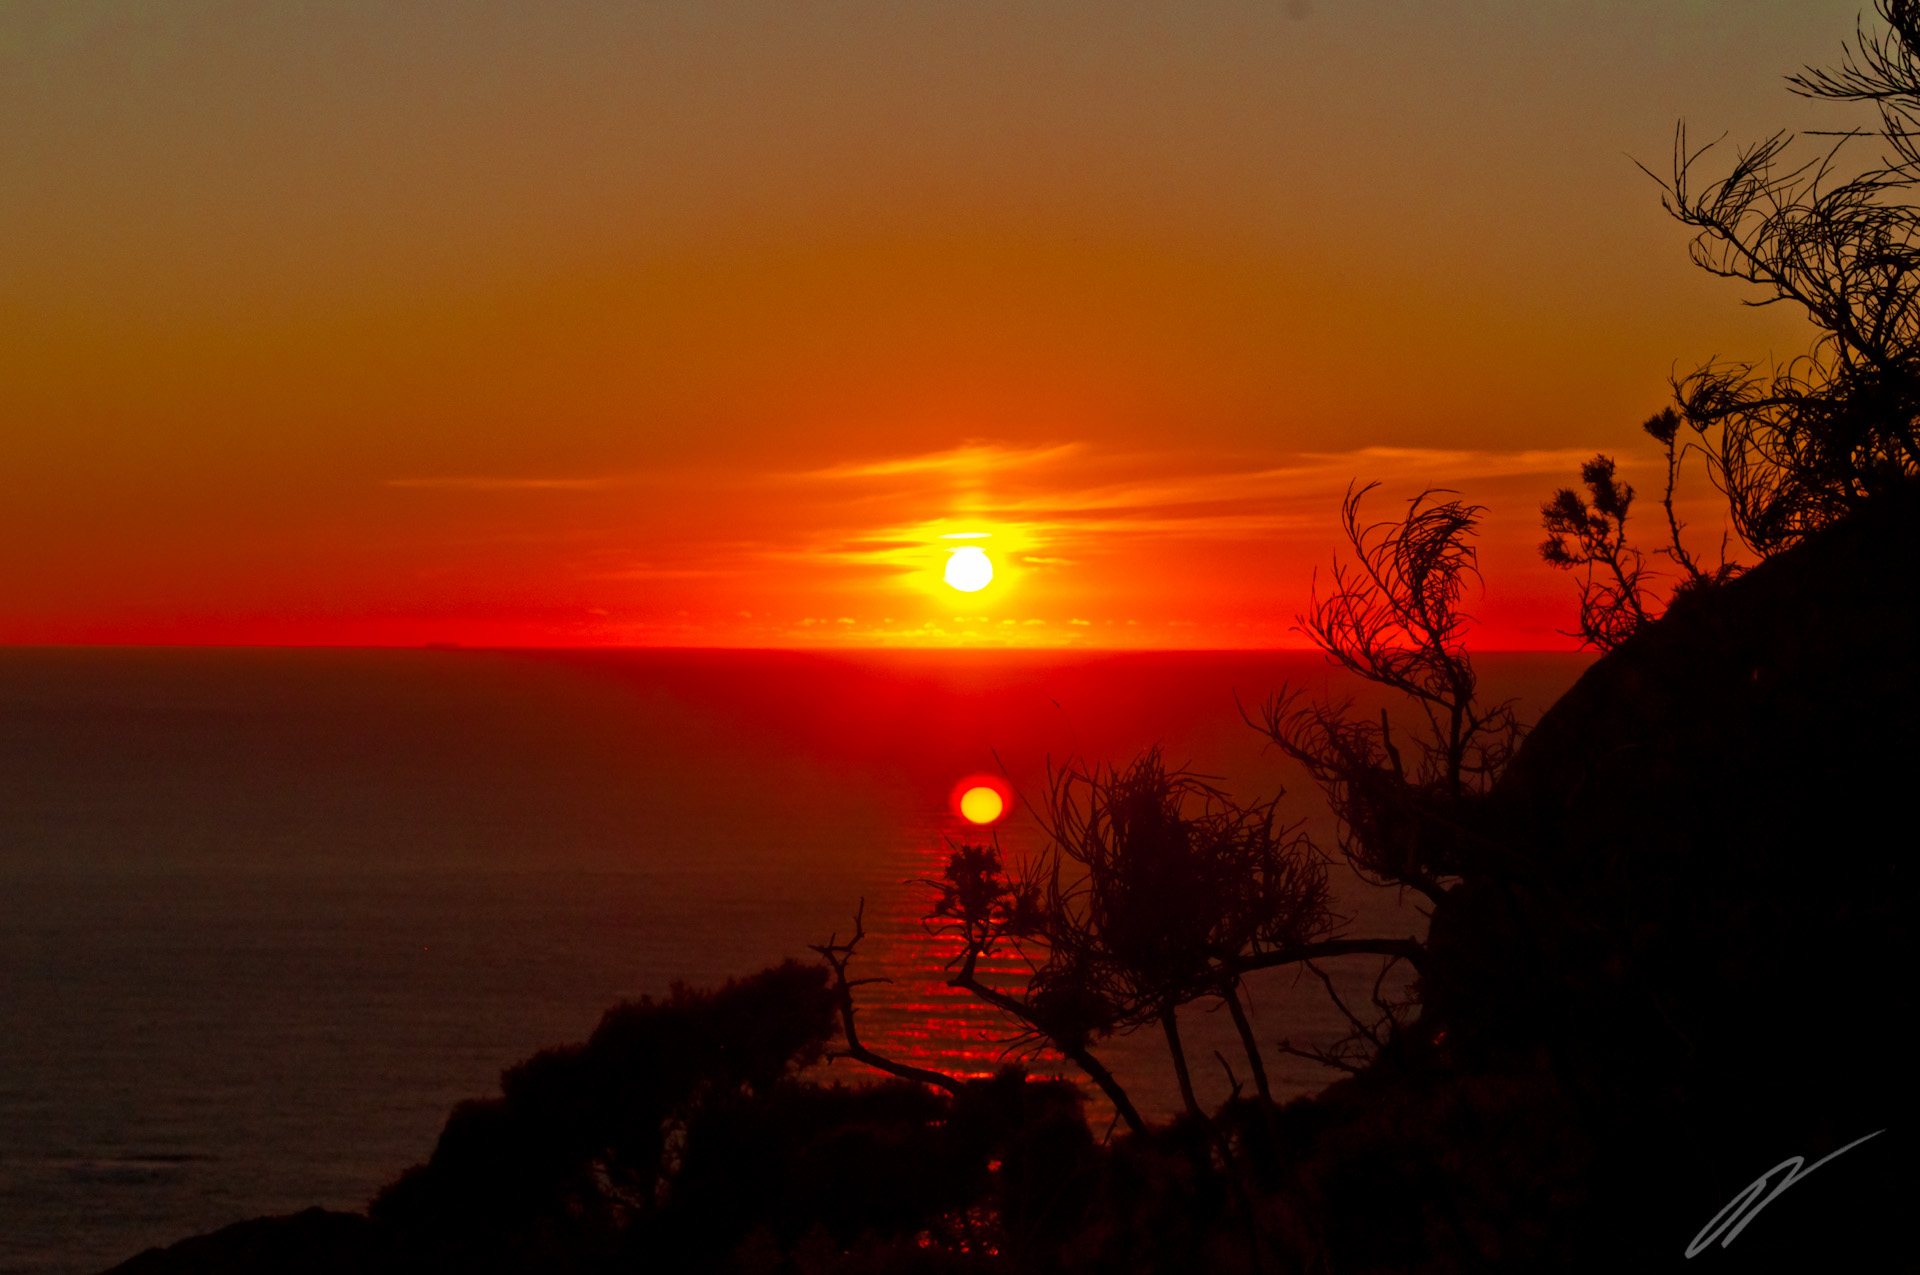 Sonnenuntergang am Kap Finisterre